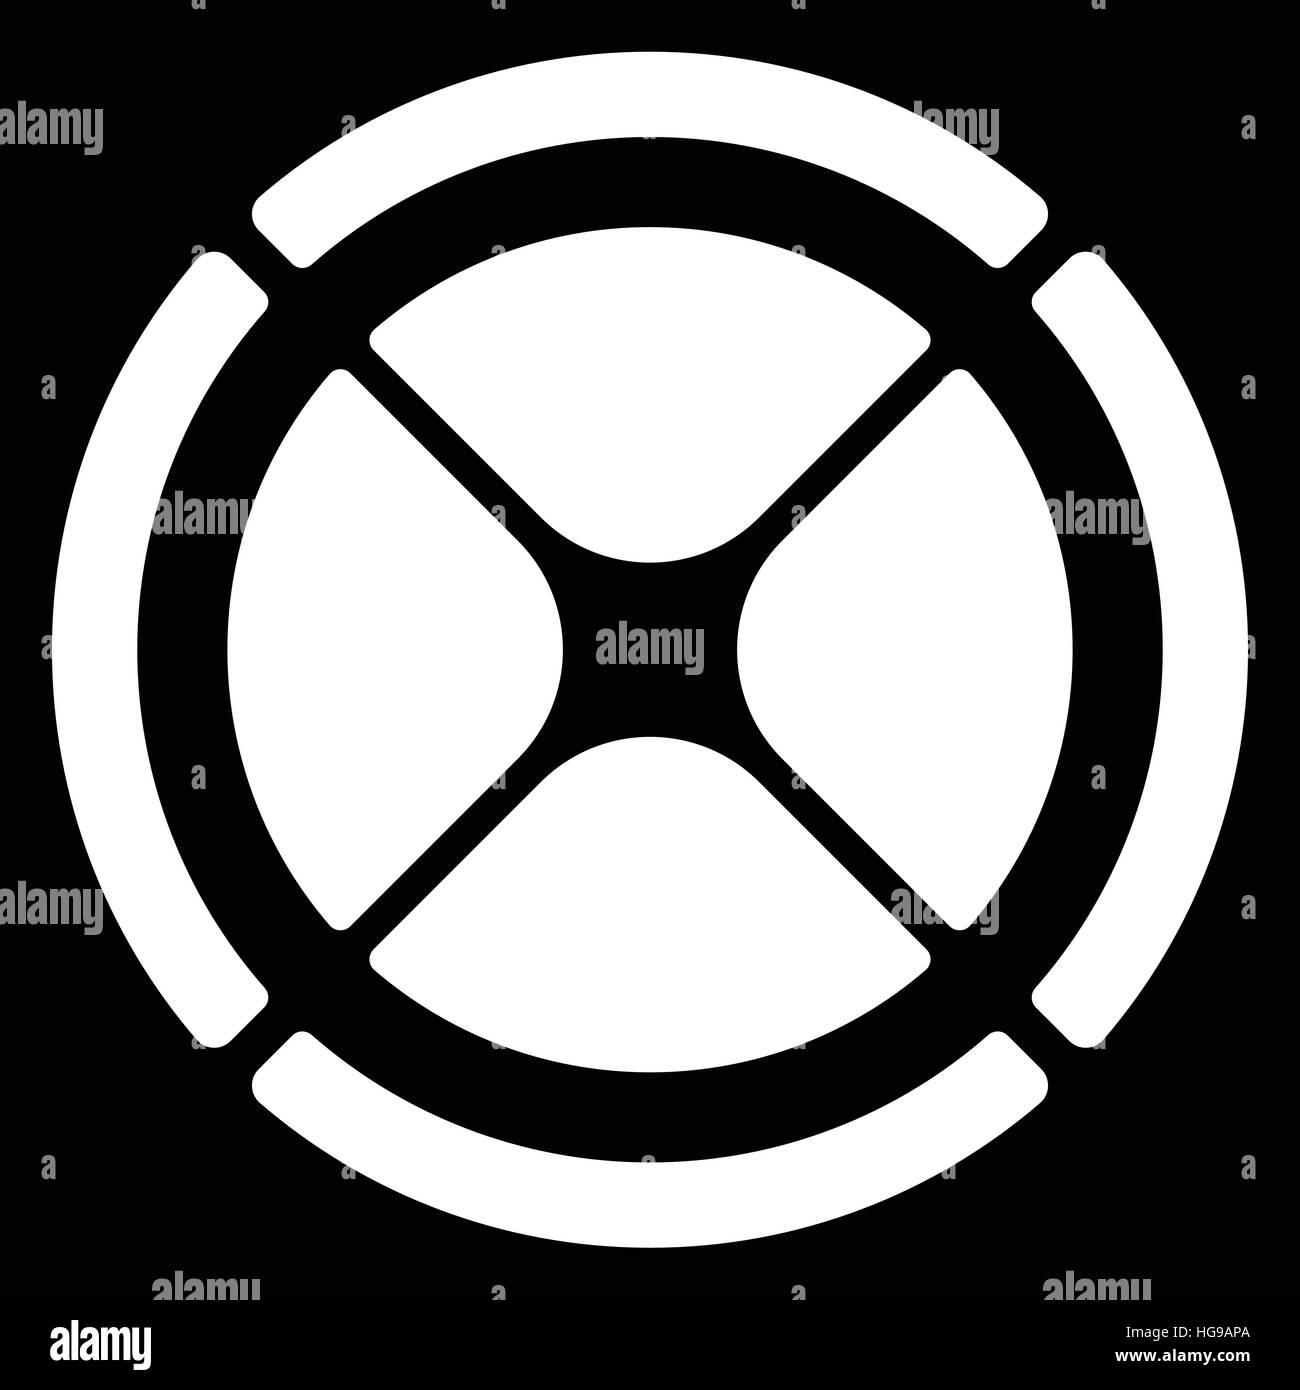 Segmented circle cross hair target symbol chart template gui segmented circle cross hair target symbol chart template gui element buycottarizona Image collections